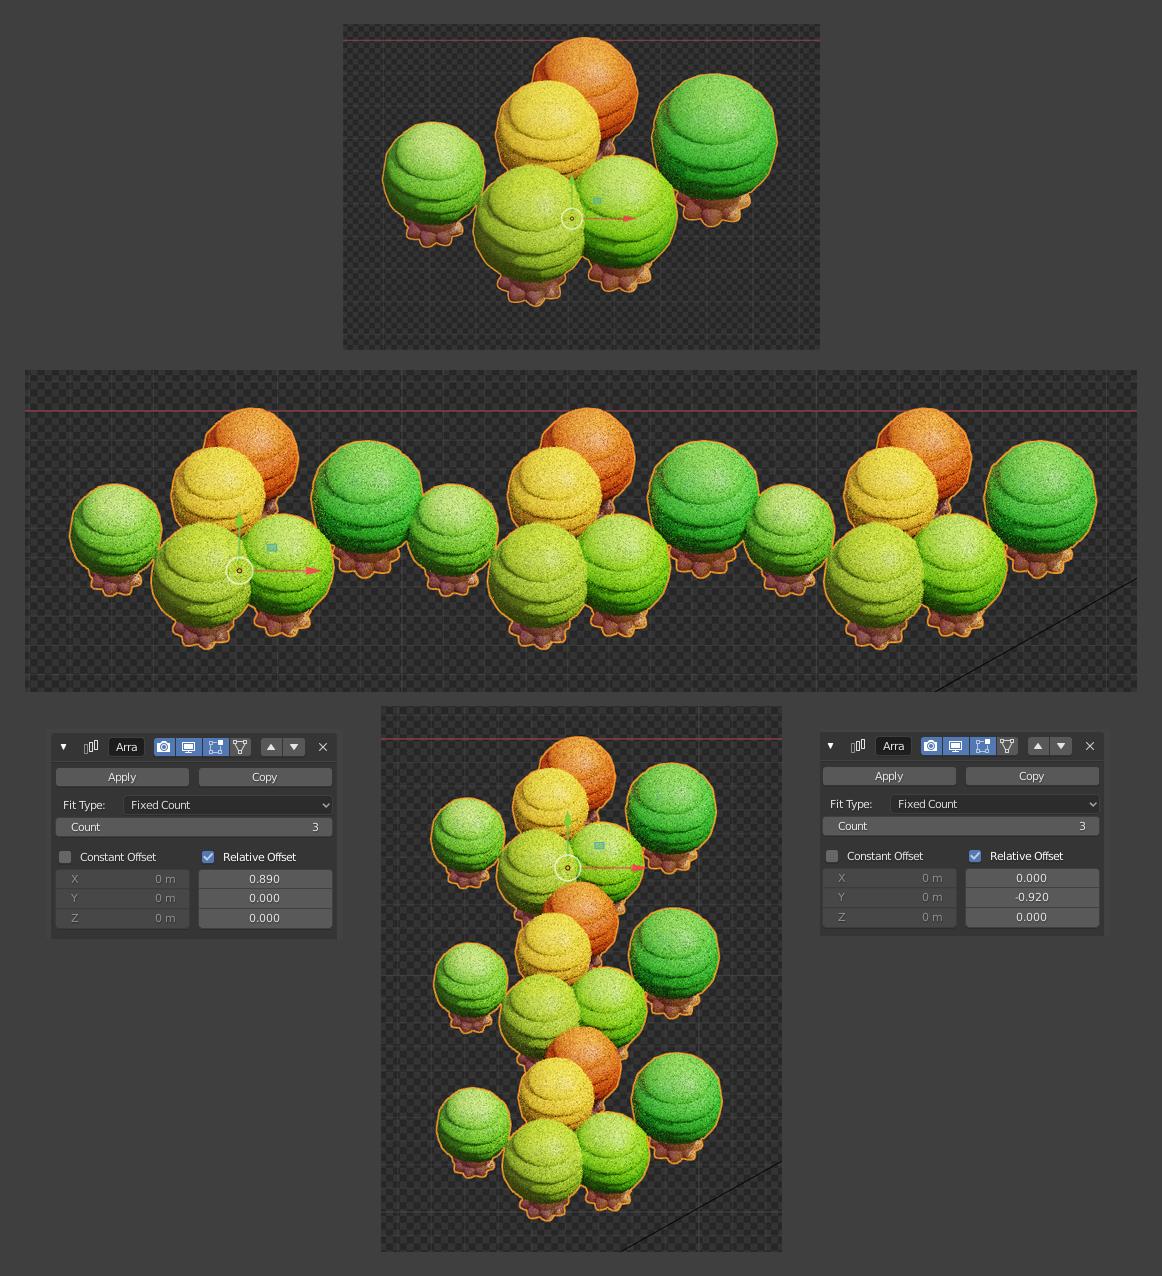 Blender制作游戏像素风格小城镇-树木、草丛的制作效果